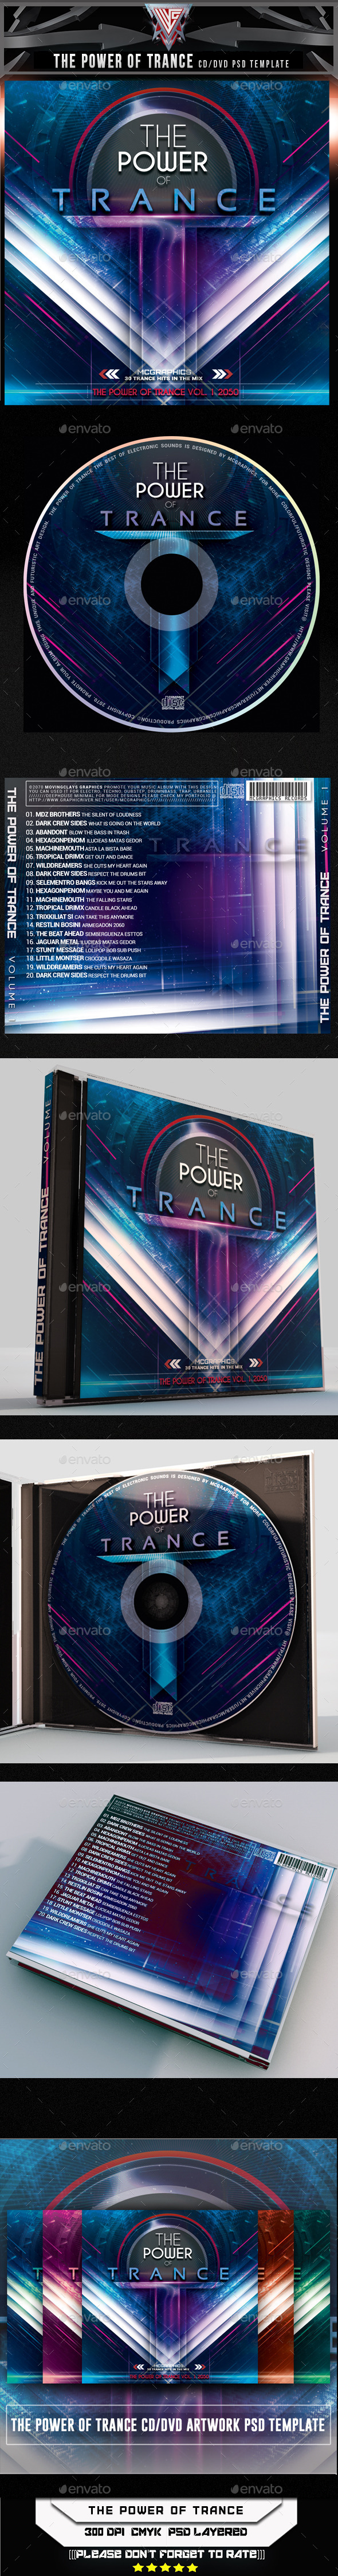 The Power of Trance CD/DVD Template - CD & DVD Artwork Print Templates